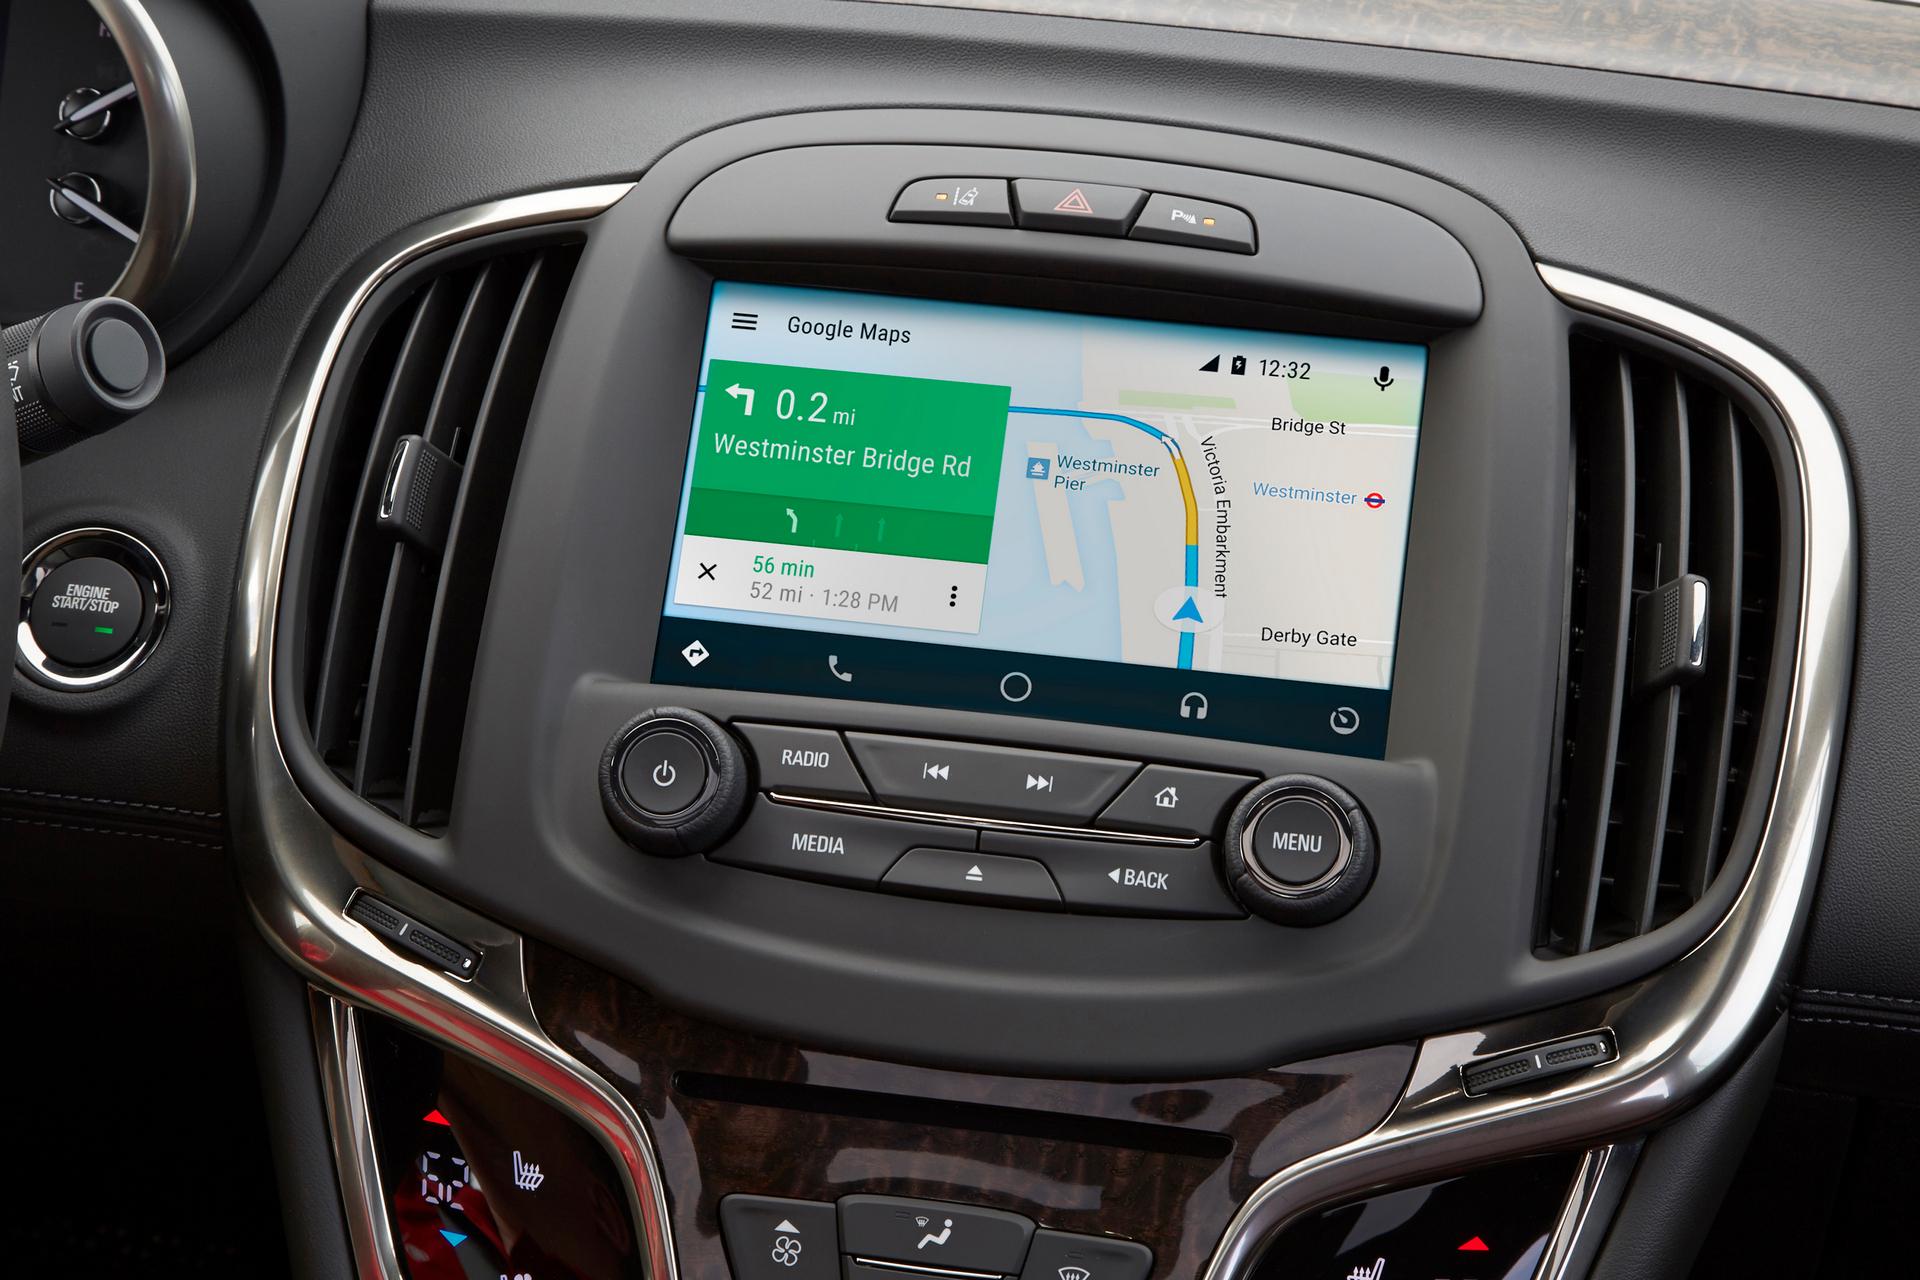 2016 Buick Regal, LaCrosse Get Android Auto Update © General Motors